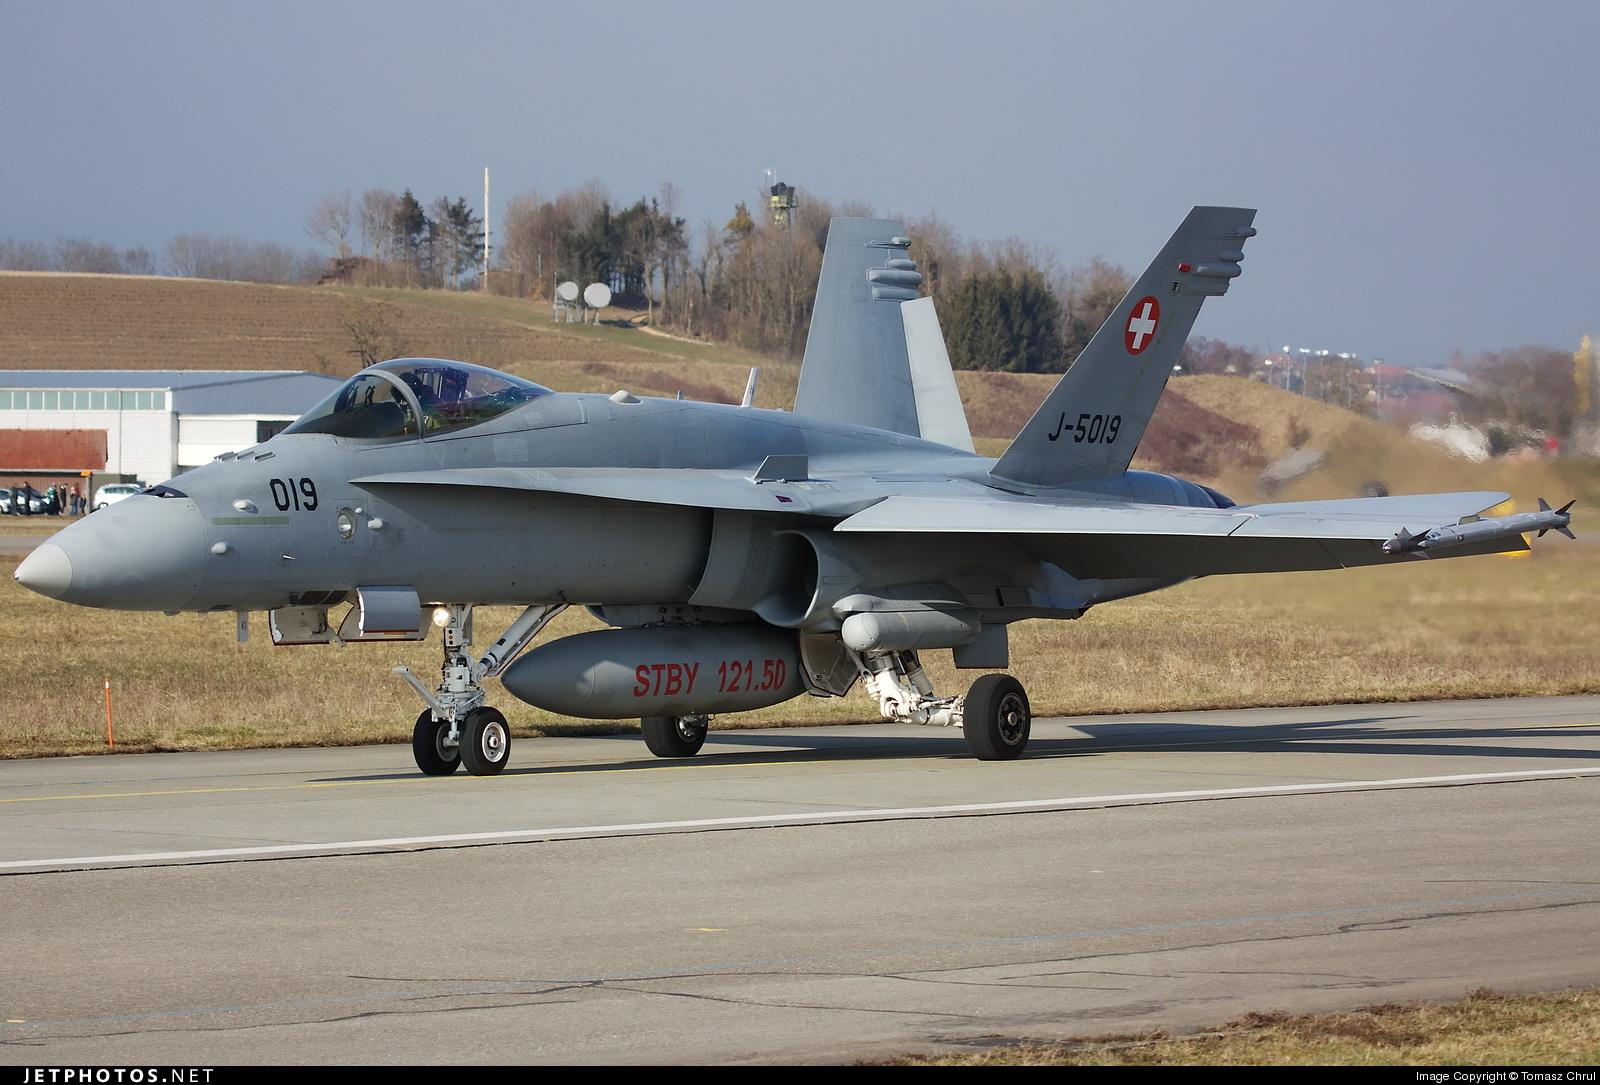 J-5019 - McDonnell Douglas F/A-18C Hornet - Switzerland - Air Force